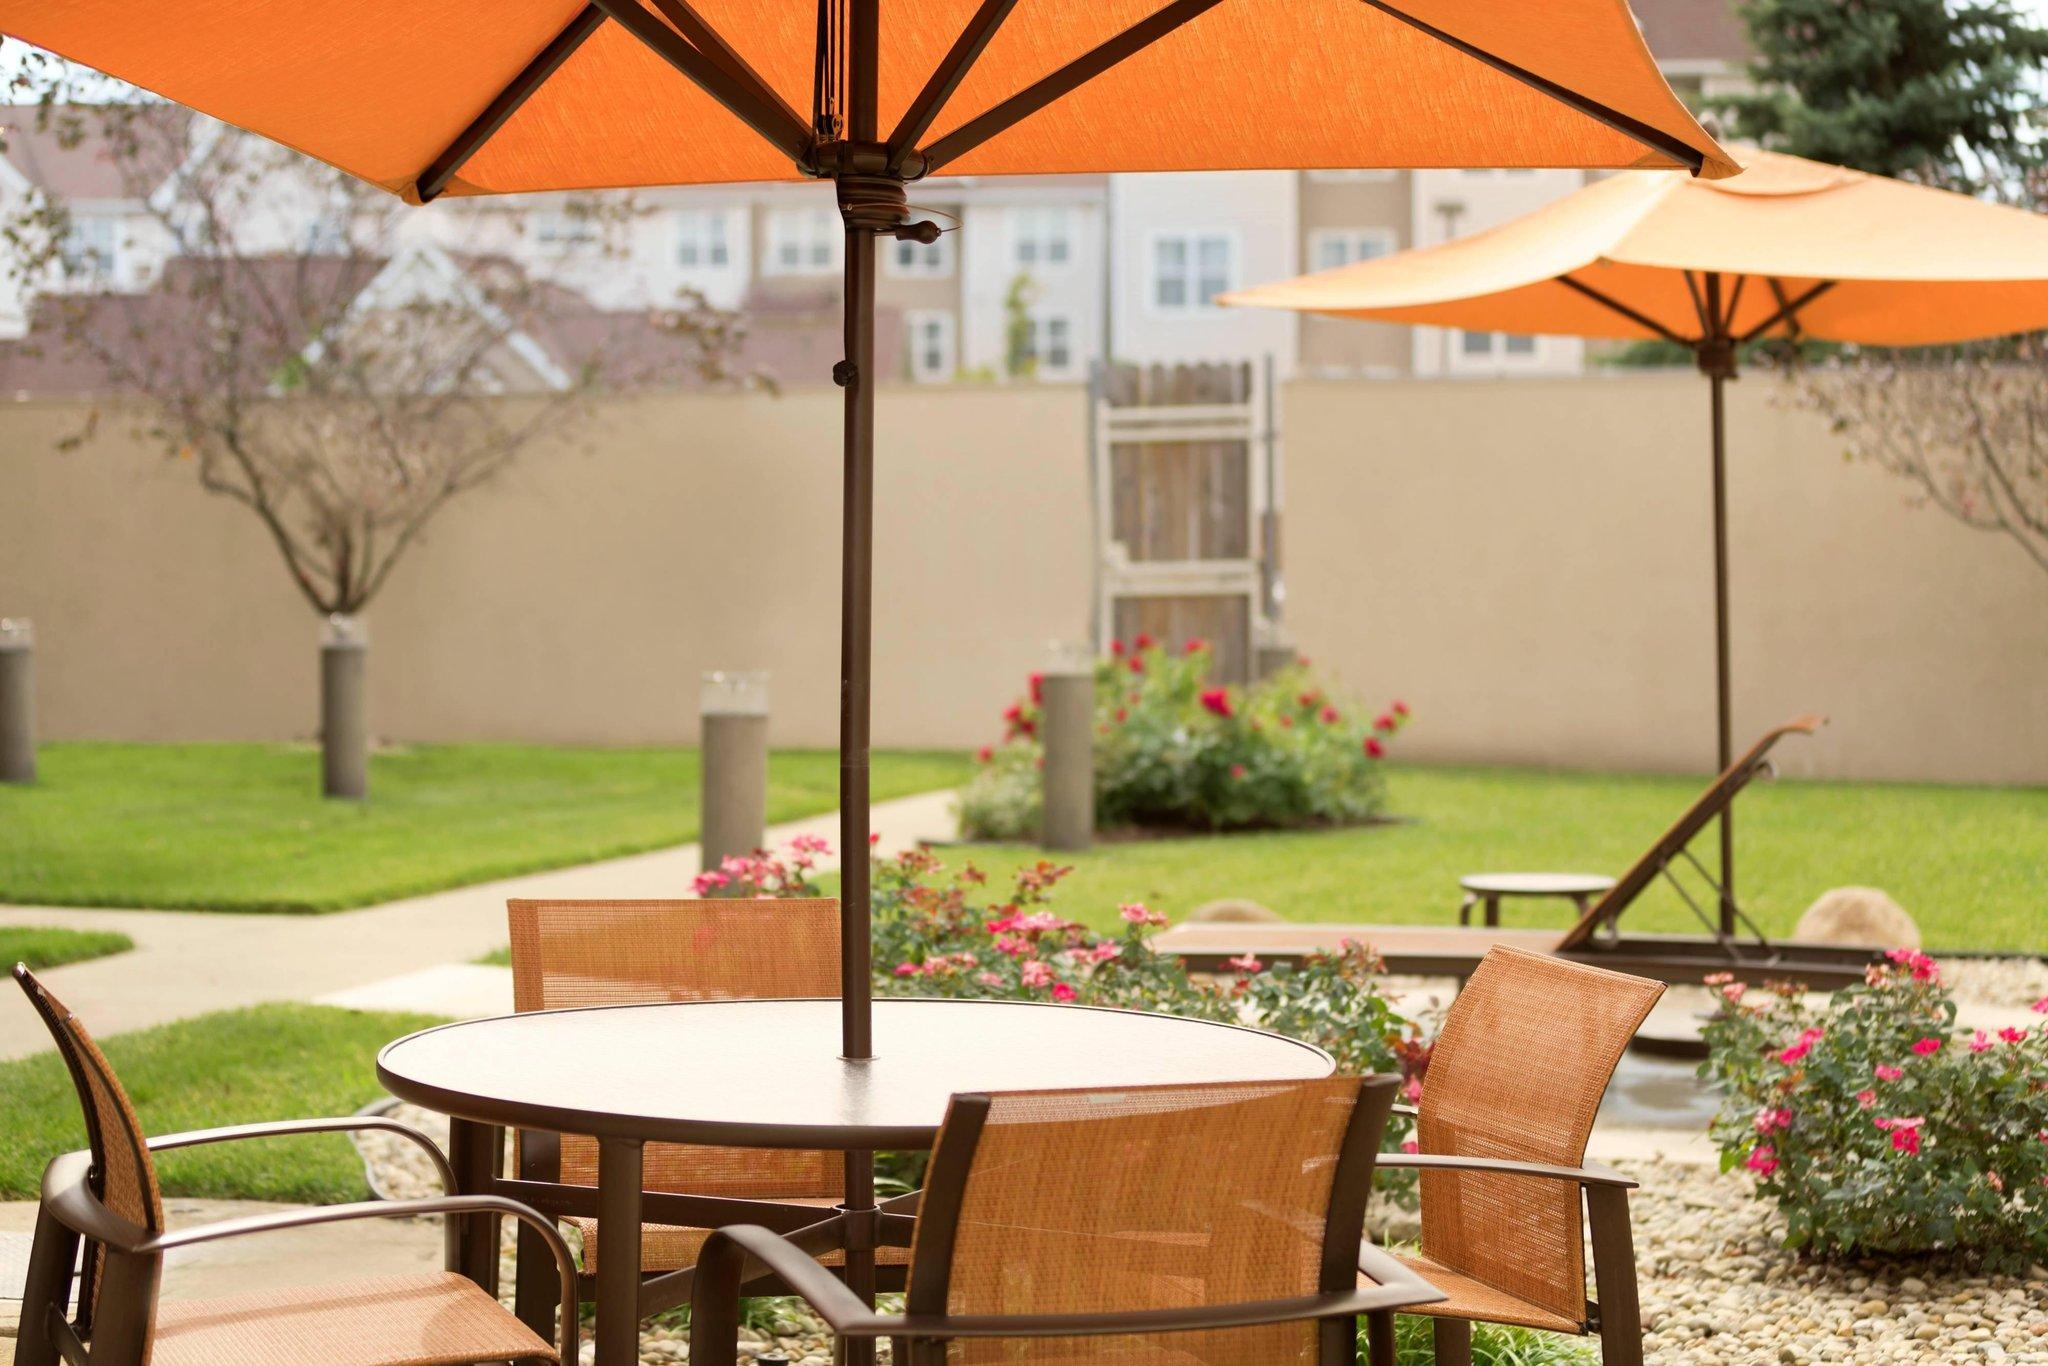 Courtyard by Marriott Dayton Beavercreek